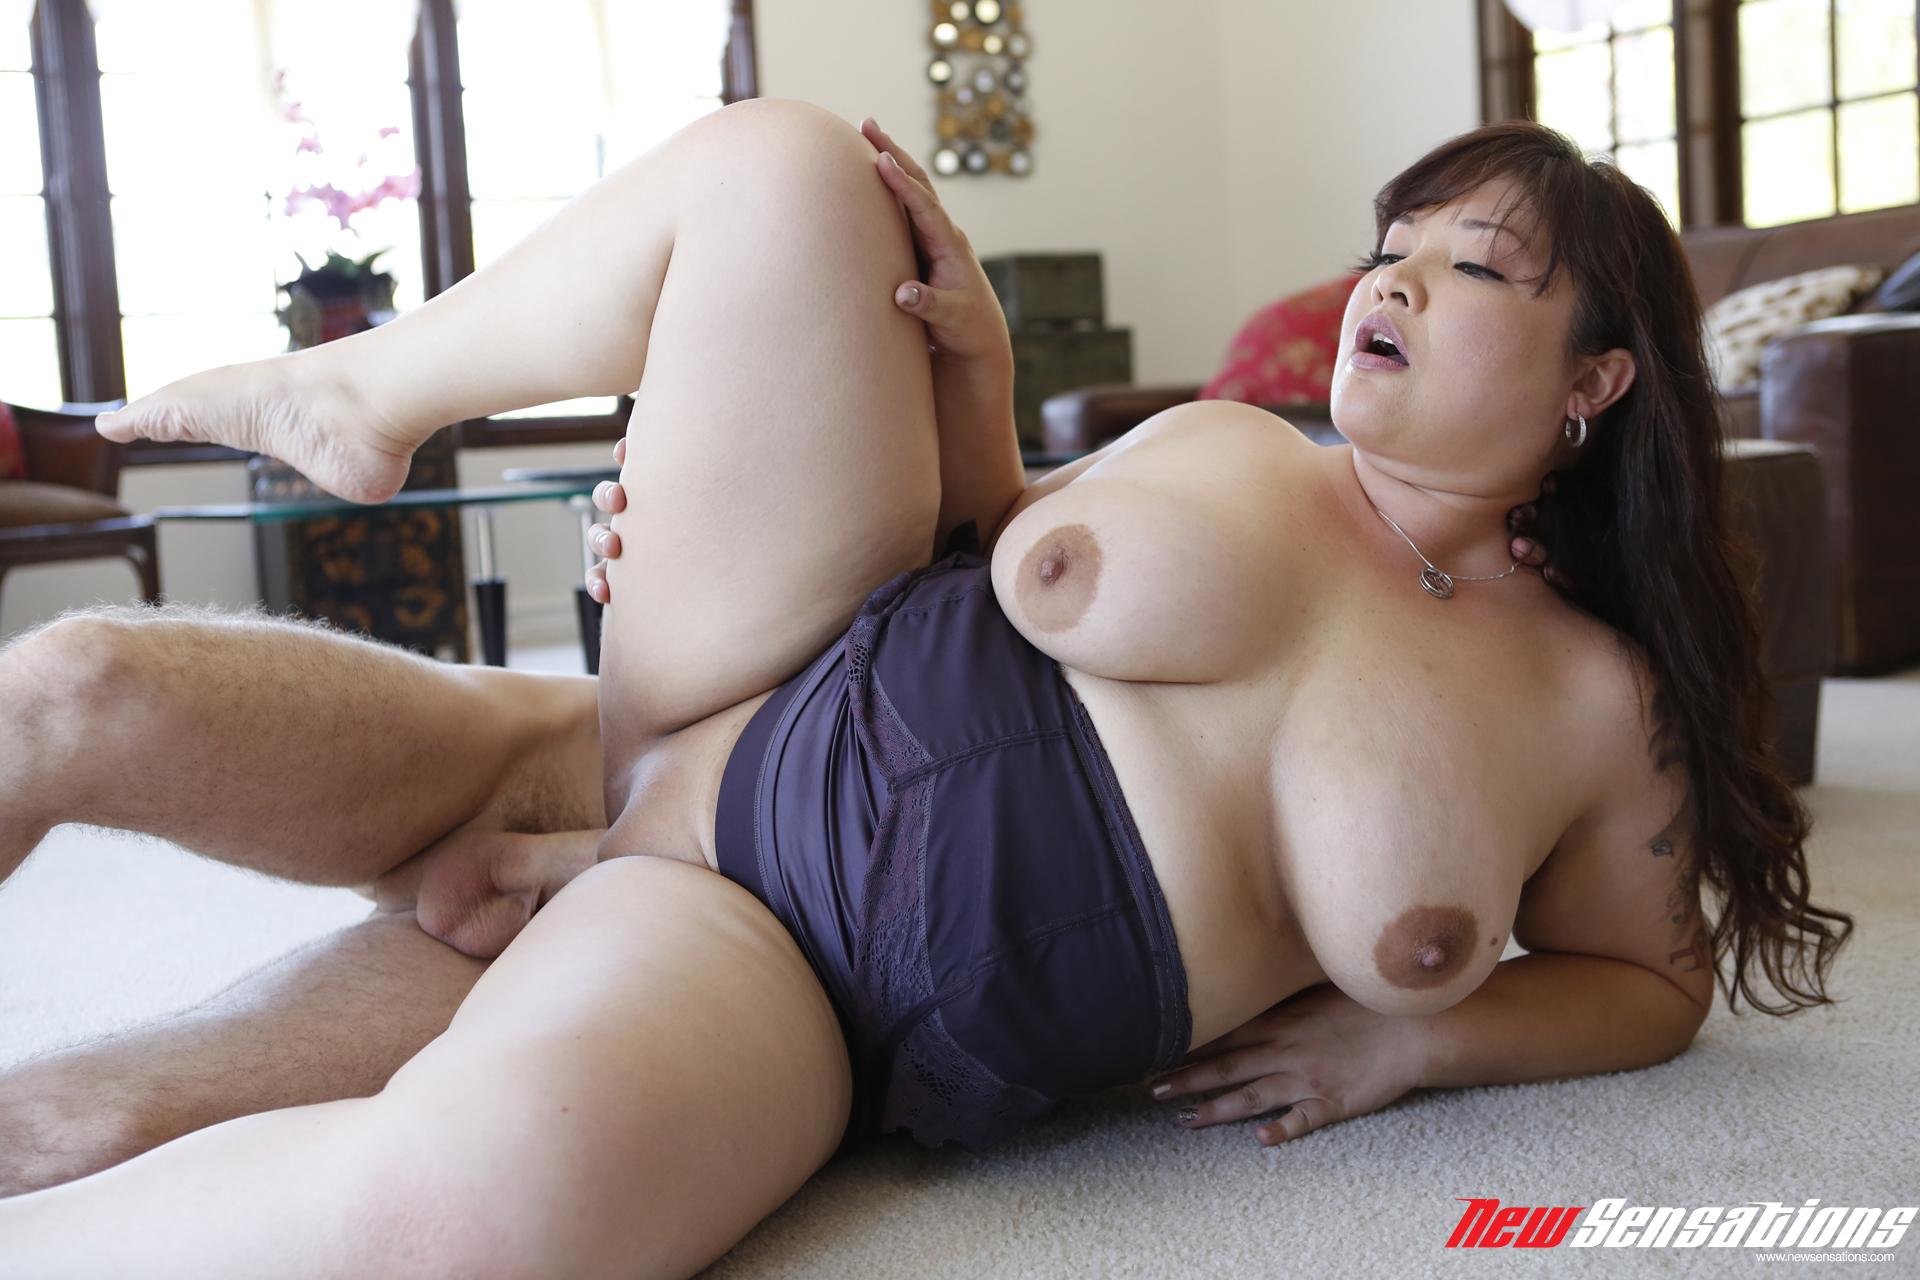 grudastie-yaponki-porno-onlayn